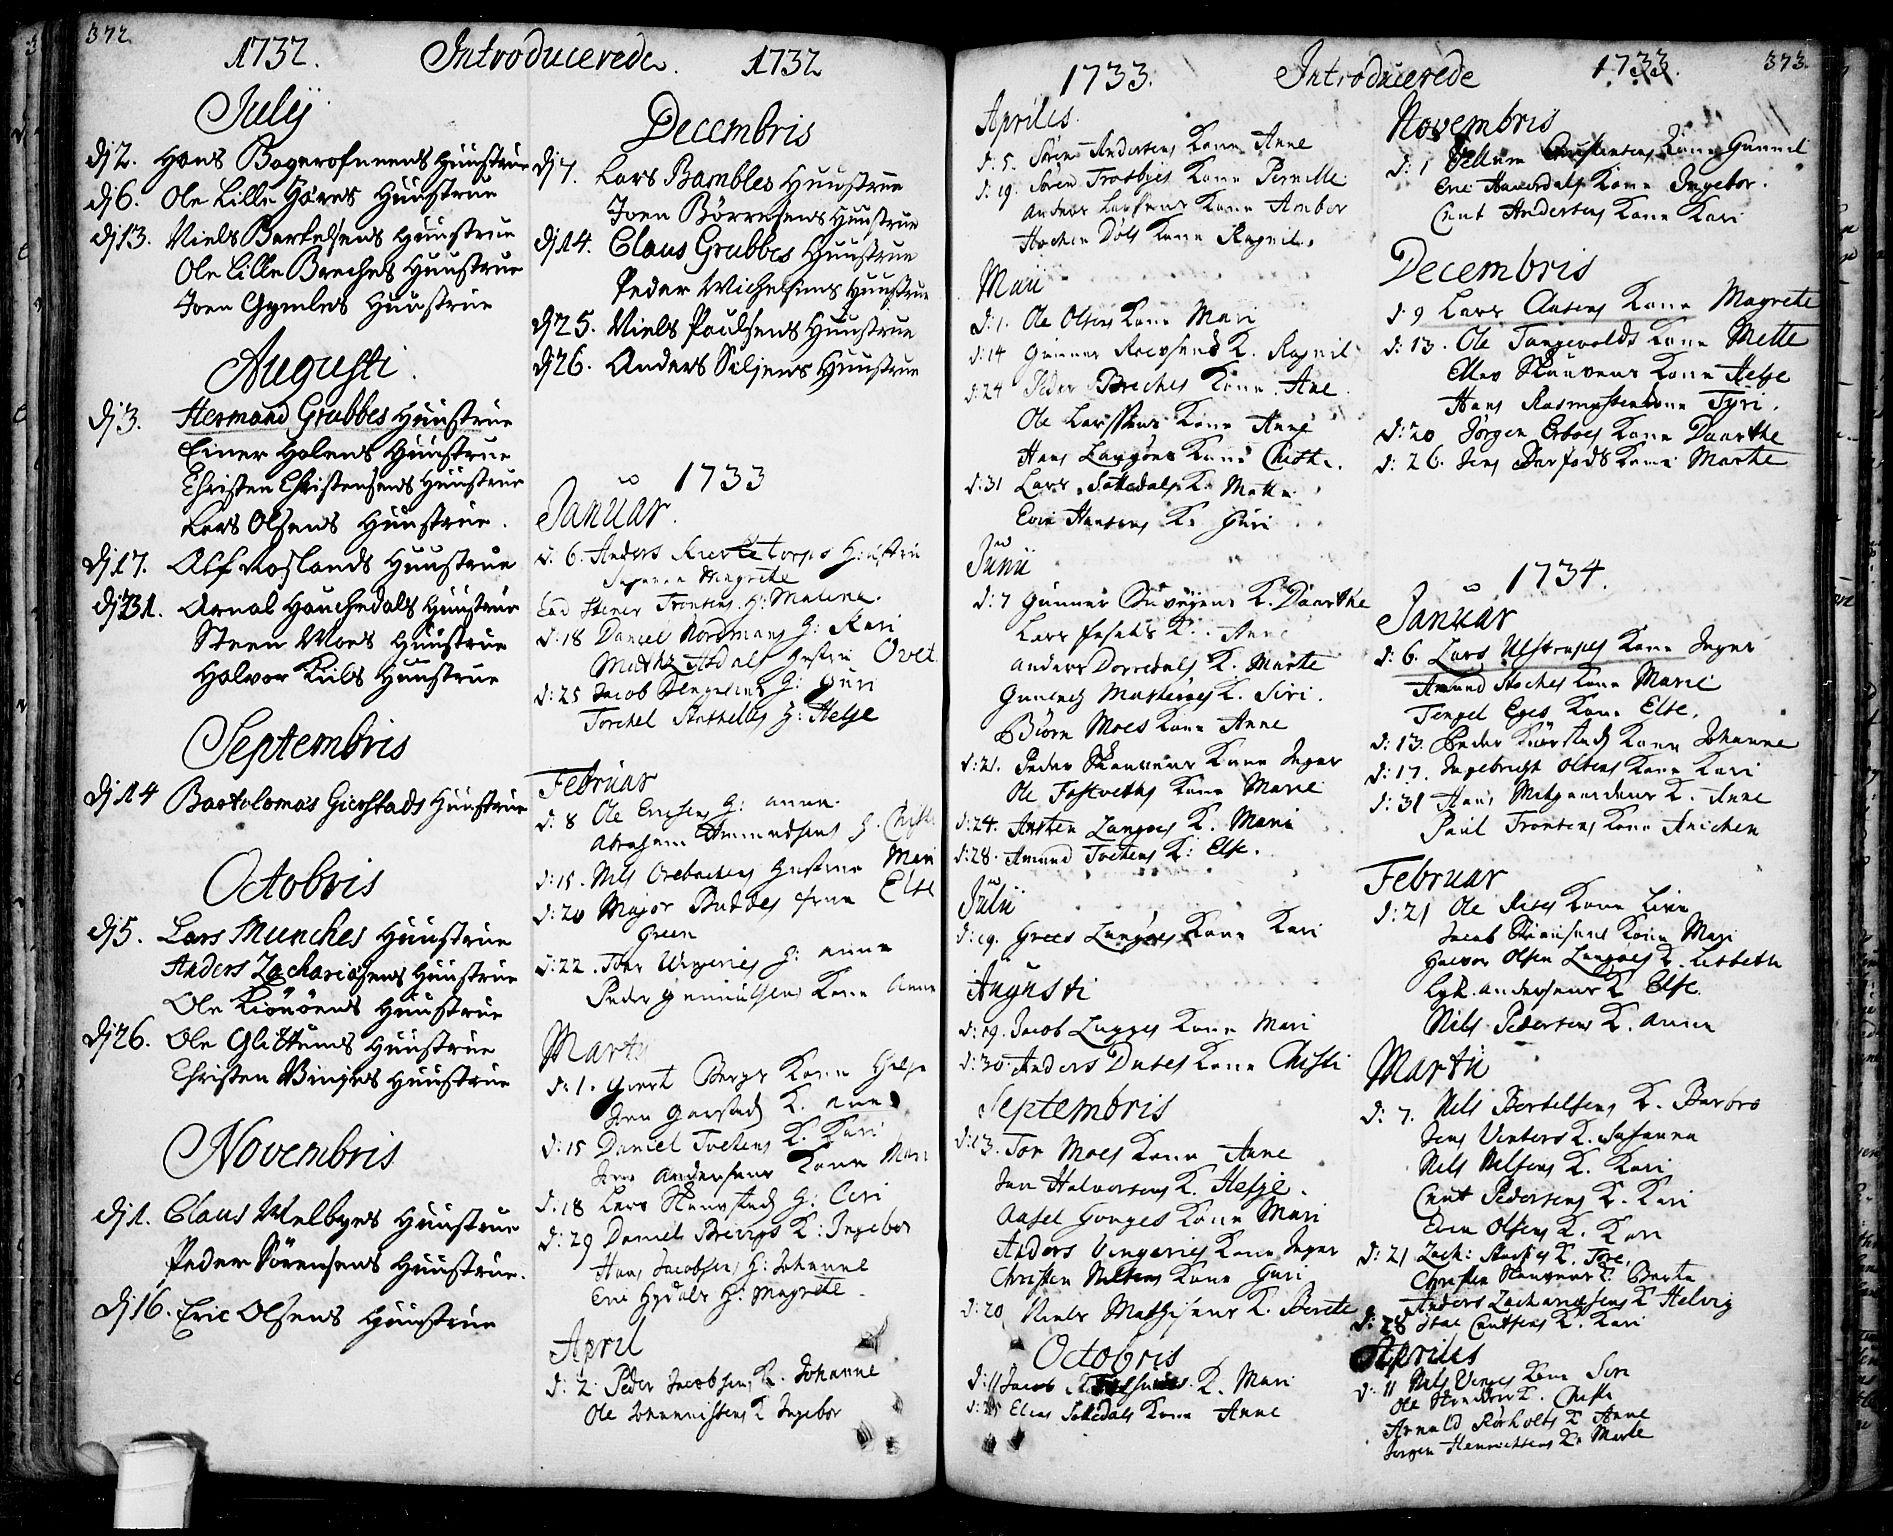 SAKO, Bamble kirkebøker, F/Fa/L0001: Ministerialbok nr. I 1, 1702-1774, s. 372-373